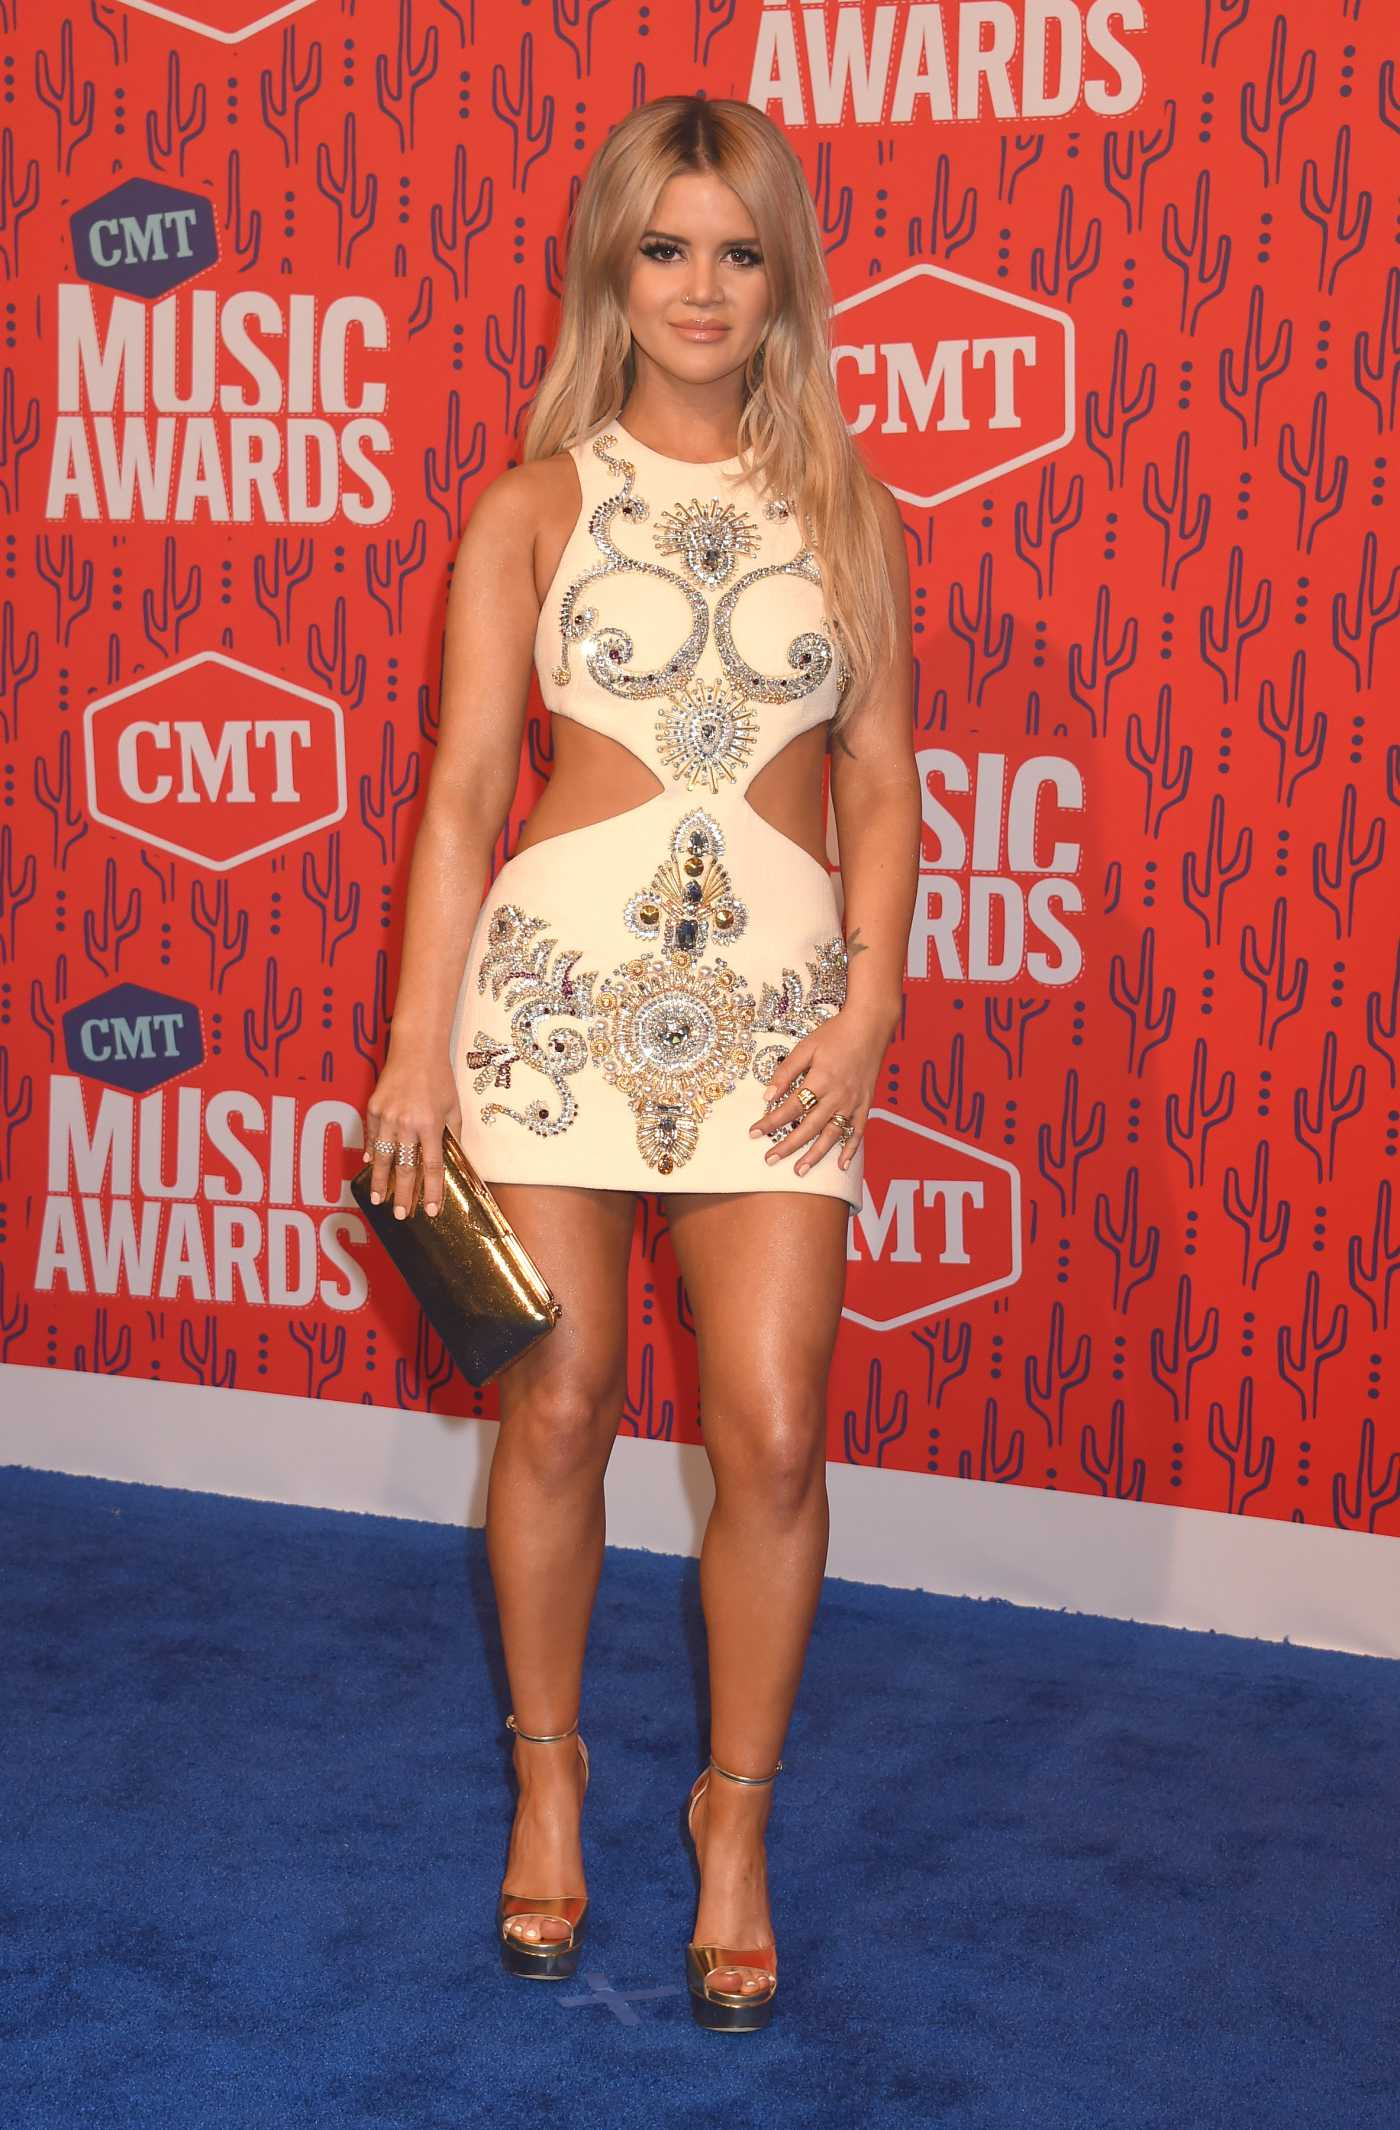 Maren Morris Attends 2019 CMT Music Awards at Bridgestone Arena in Nashville 06/05/2019